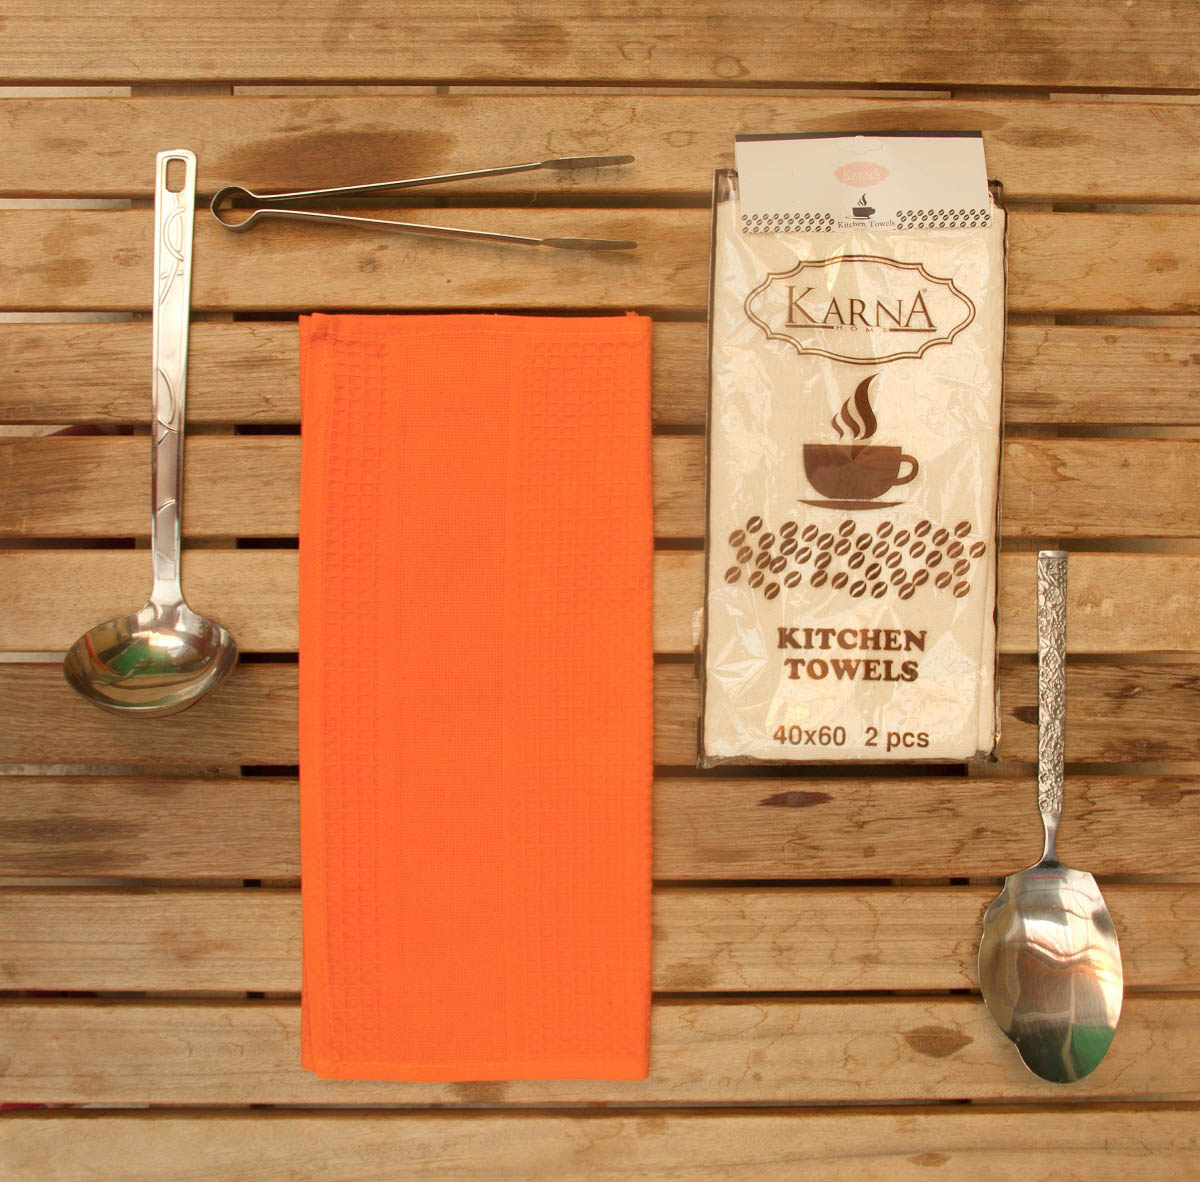 Полотенца Medley Кухонное полотенце Rosemary Цвет: Оранжевый (40х60 см - 2 шт) primavelle кухонное полотенце floressa цвет фиолетовый 40х60 см 2 шт